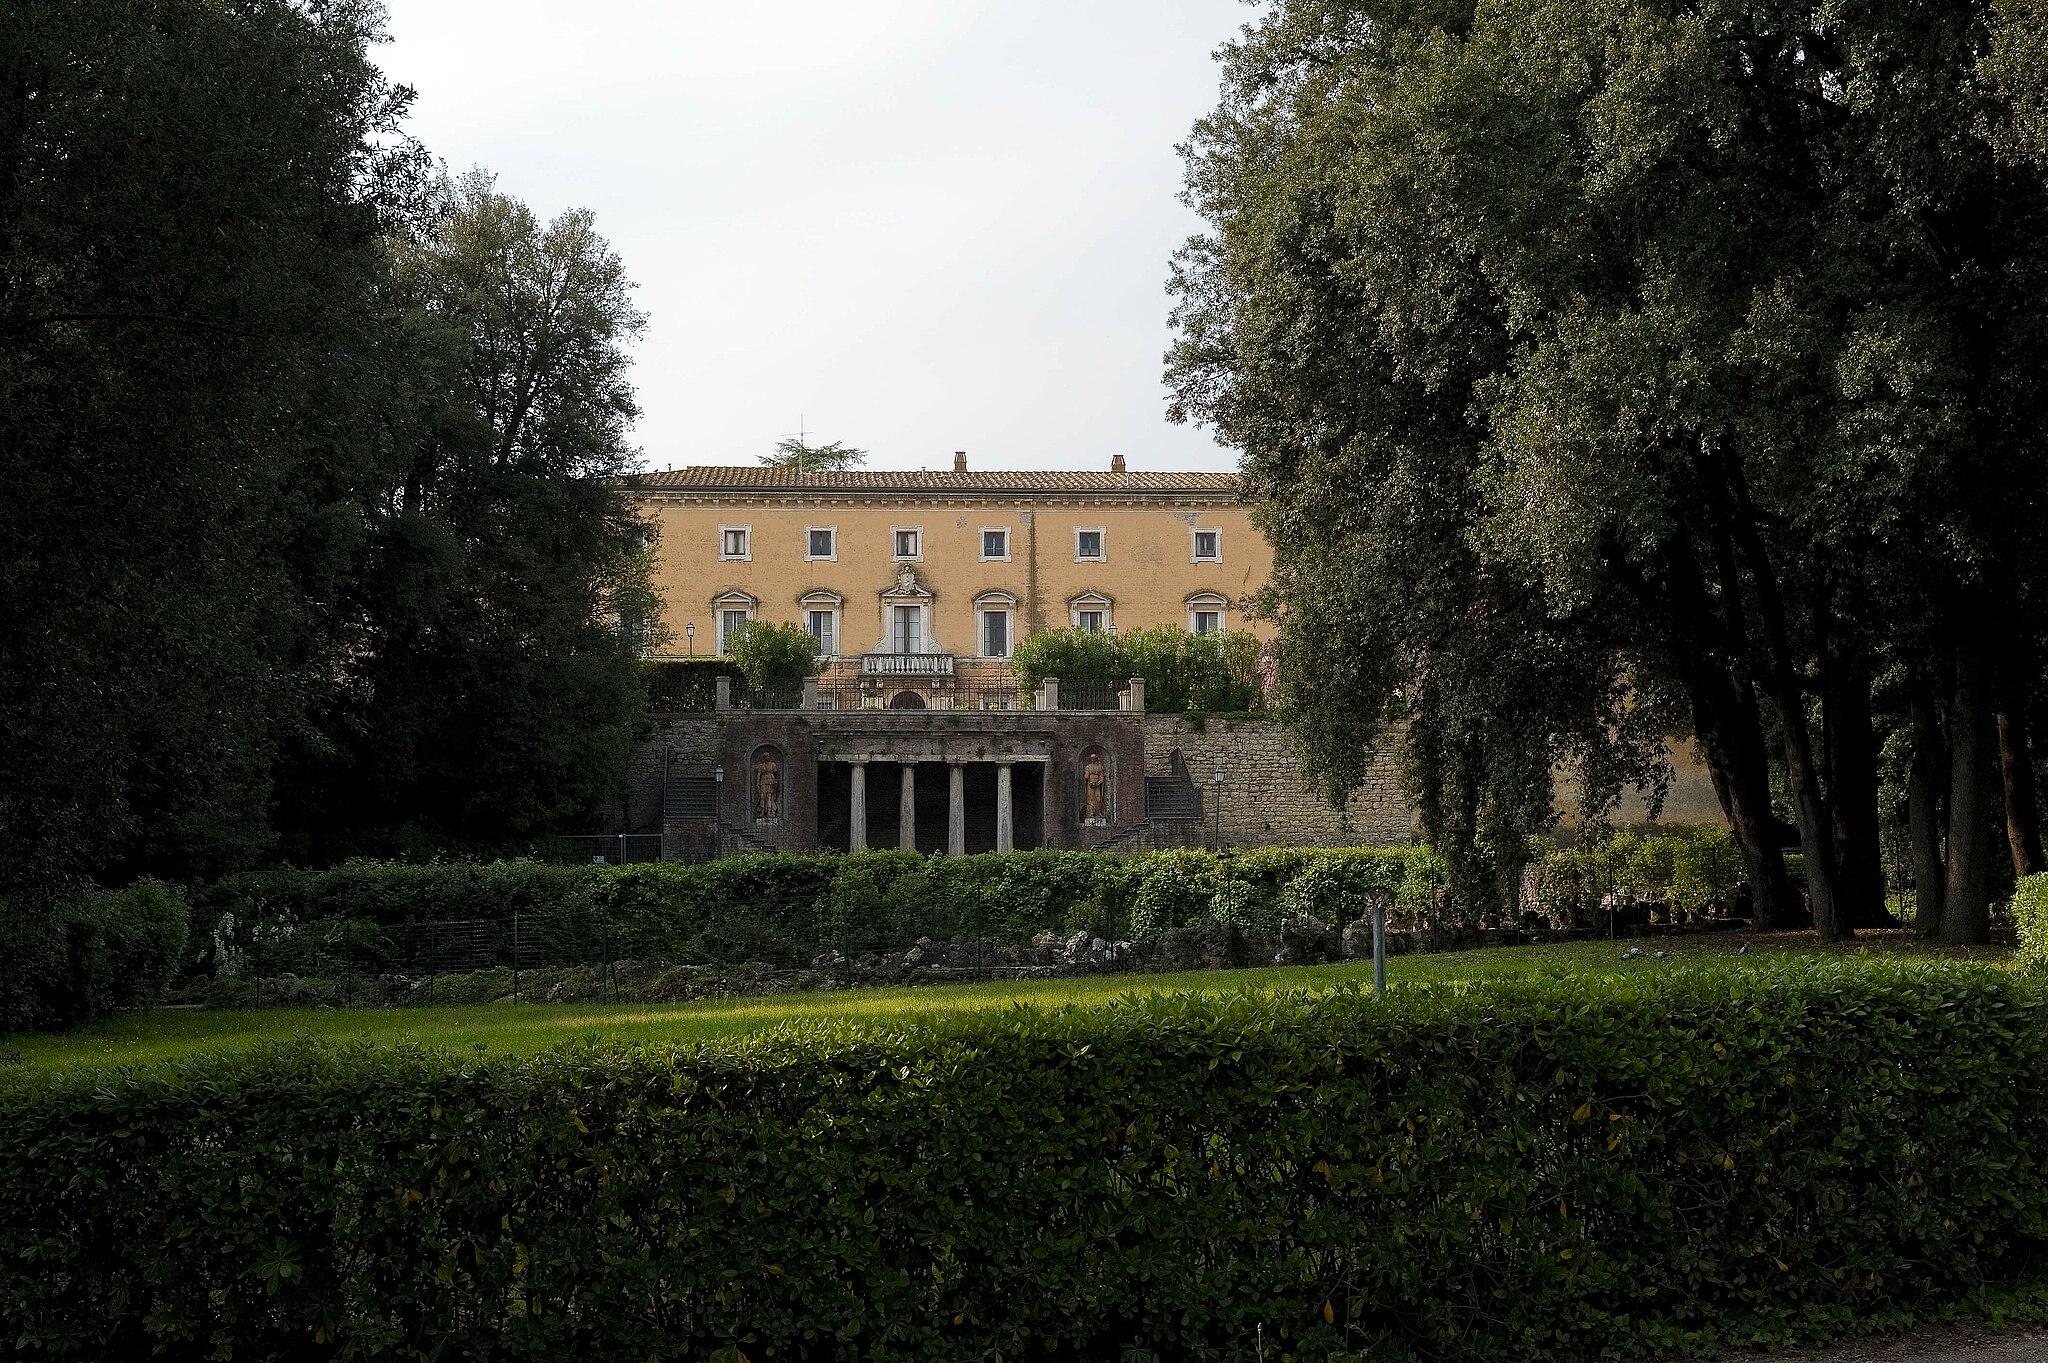 Villa Chigi Saracini, vicino a Castelnuovo Berardenga